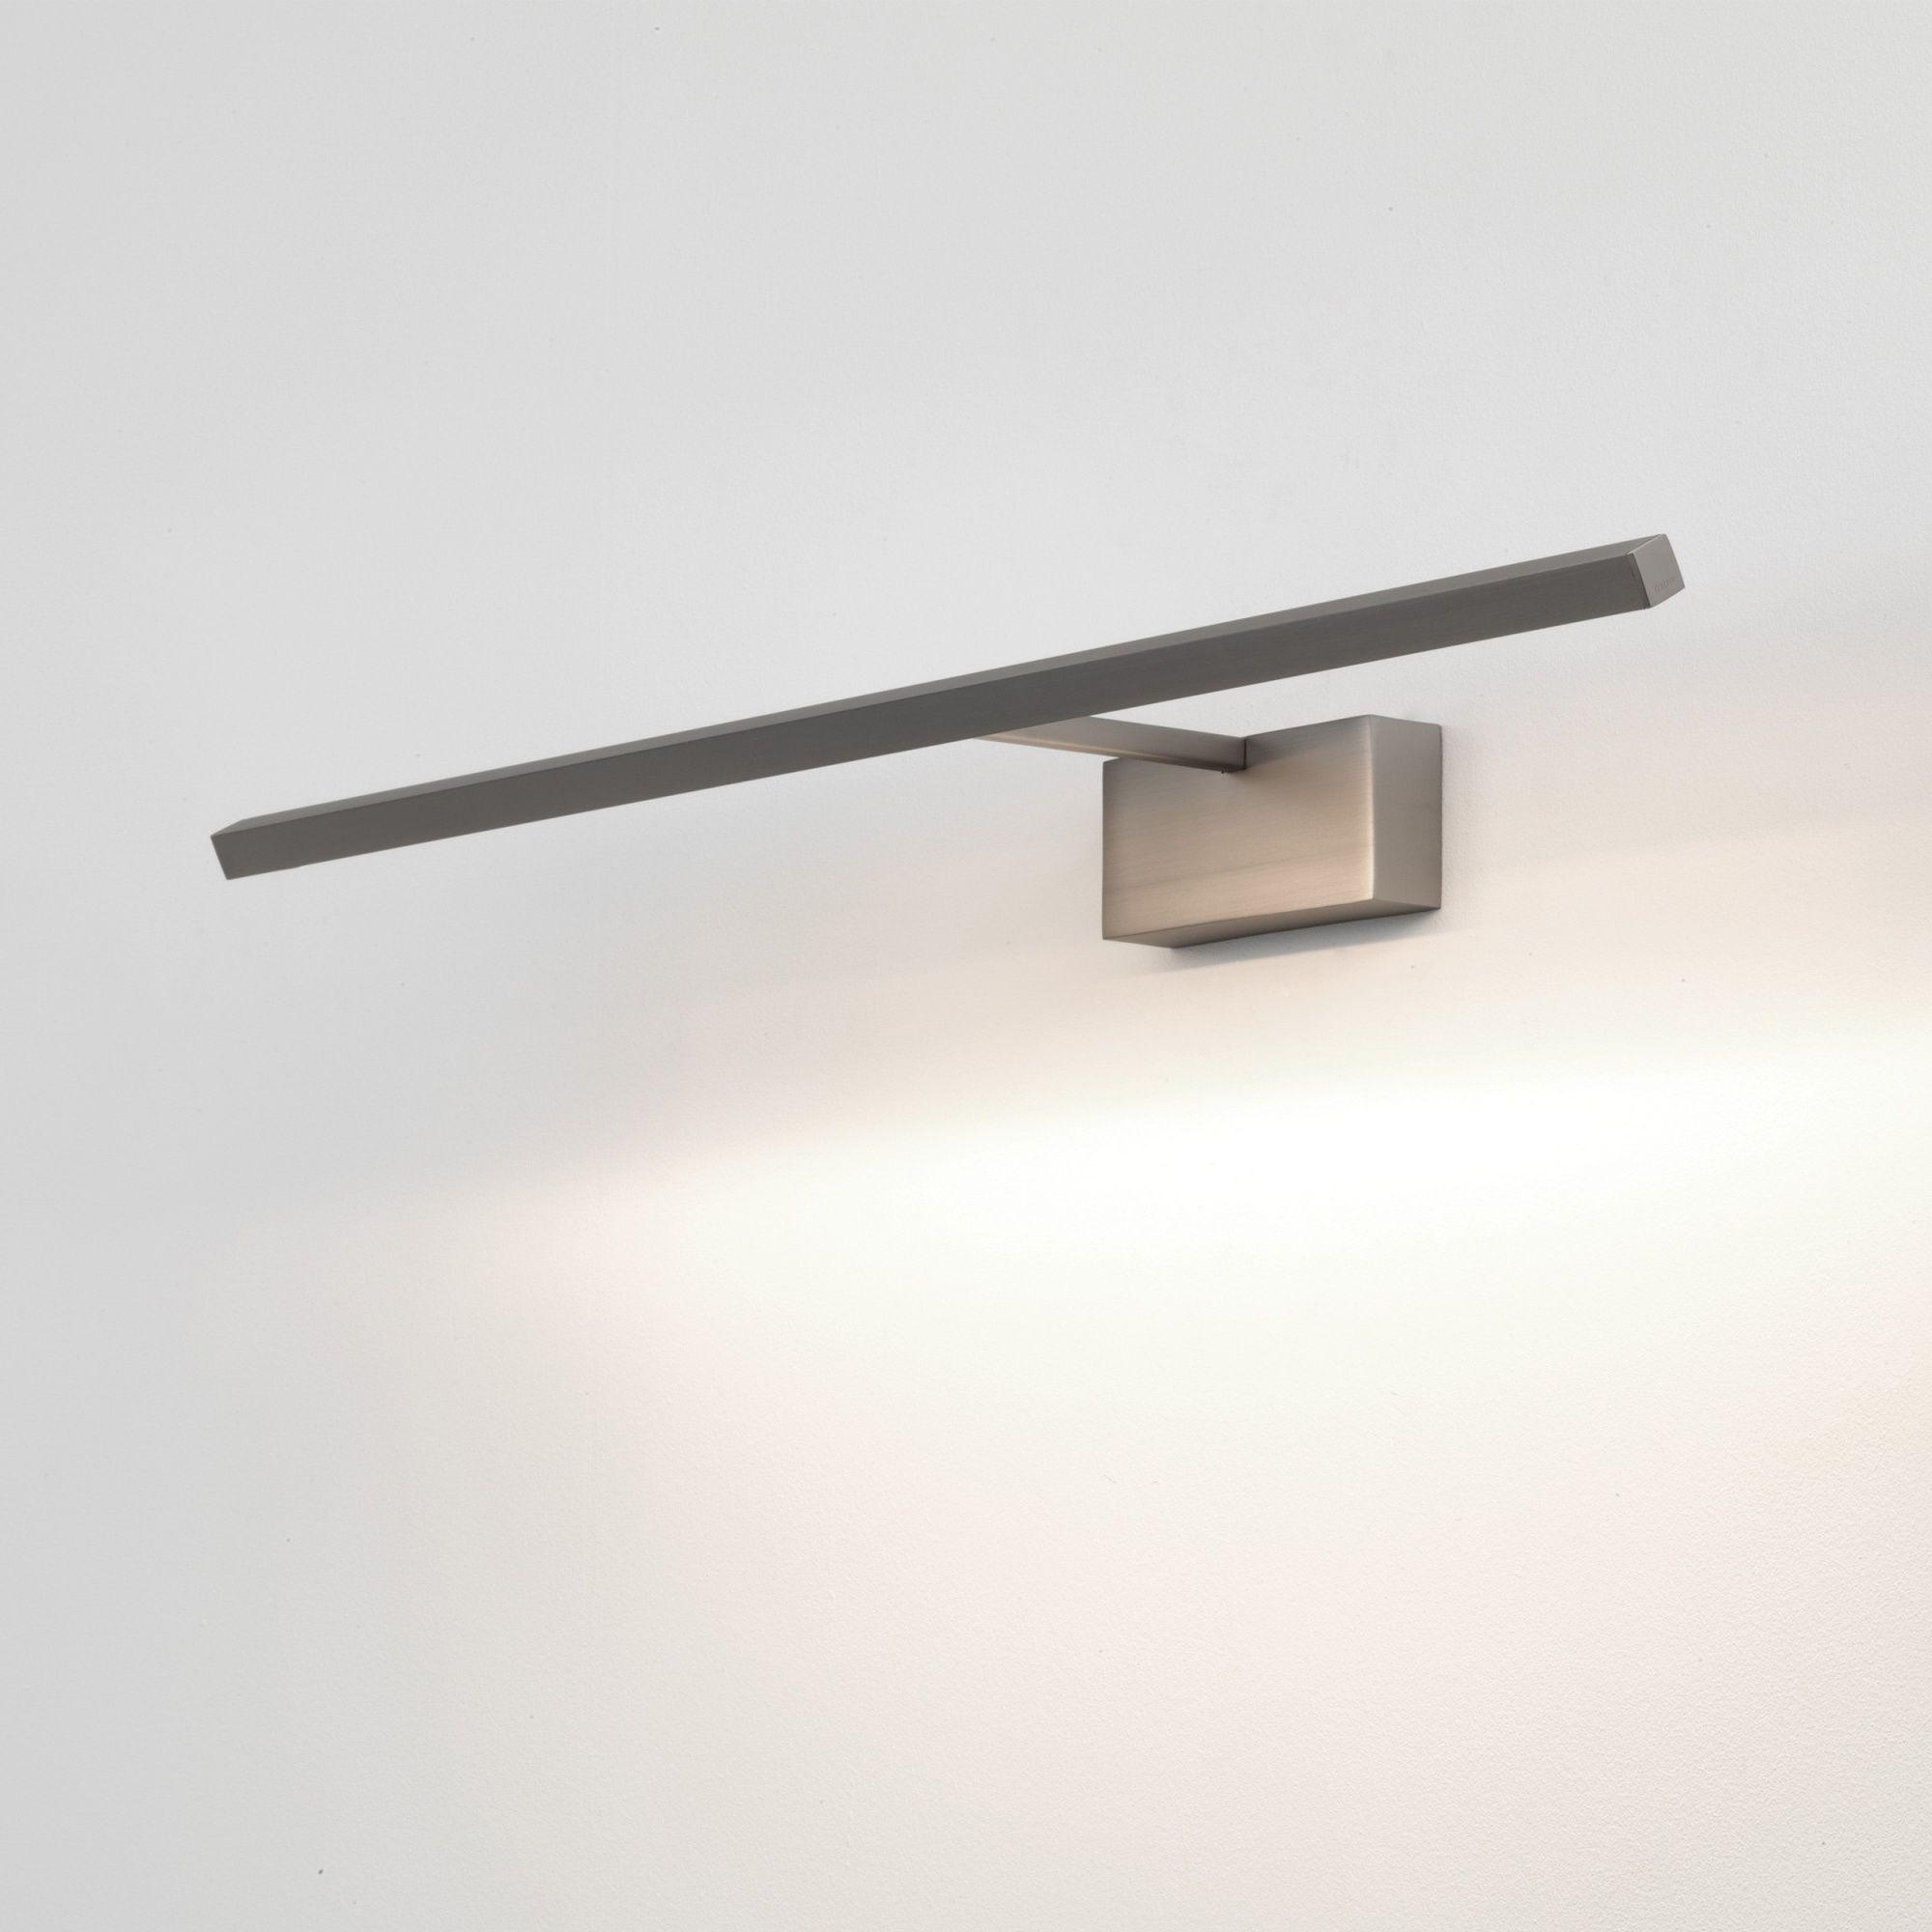 Kinkiet nad obrazy Mondrian 600 7885 Astro Lighting